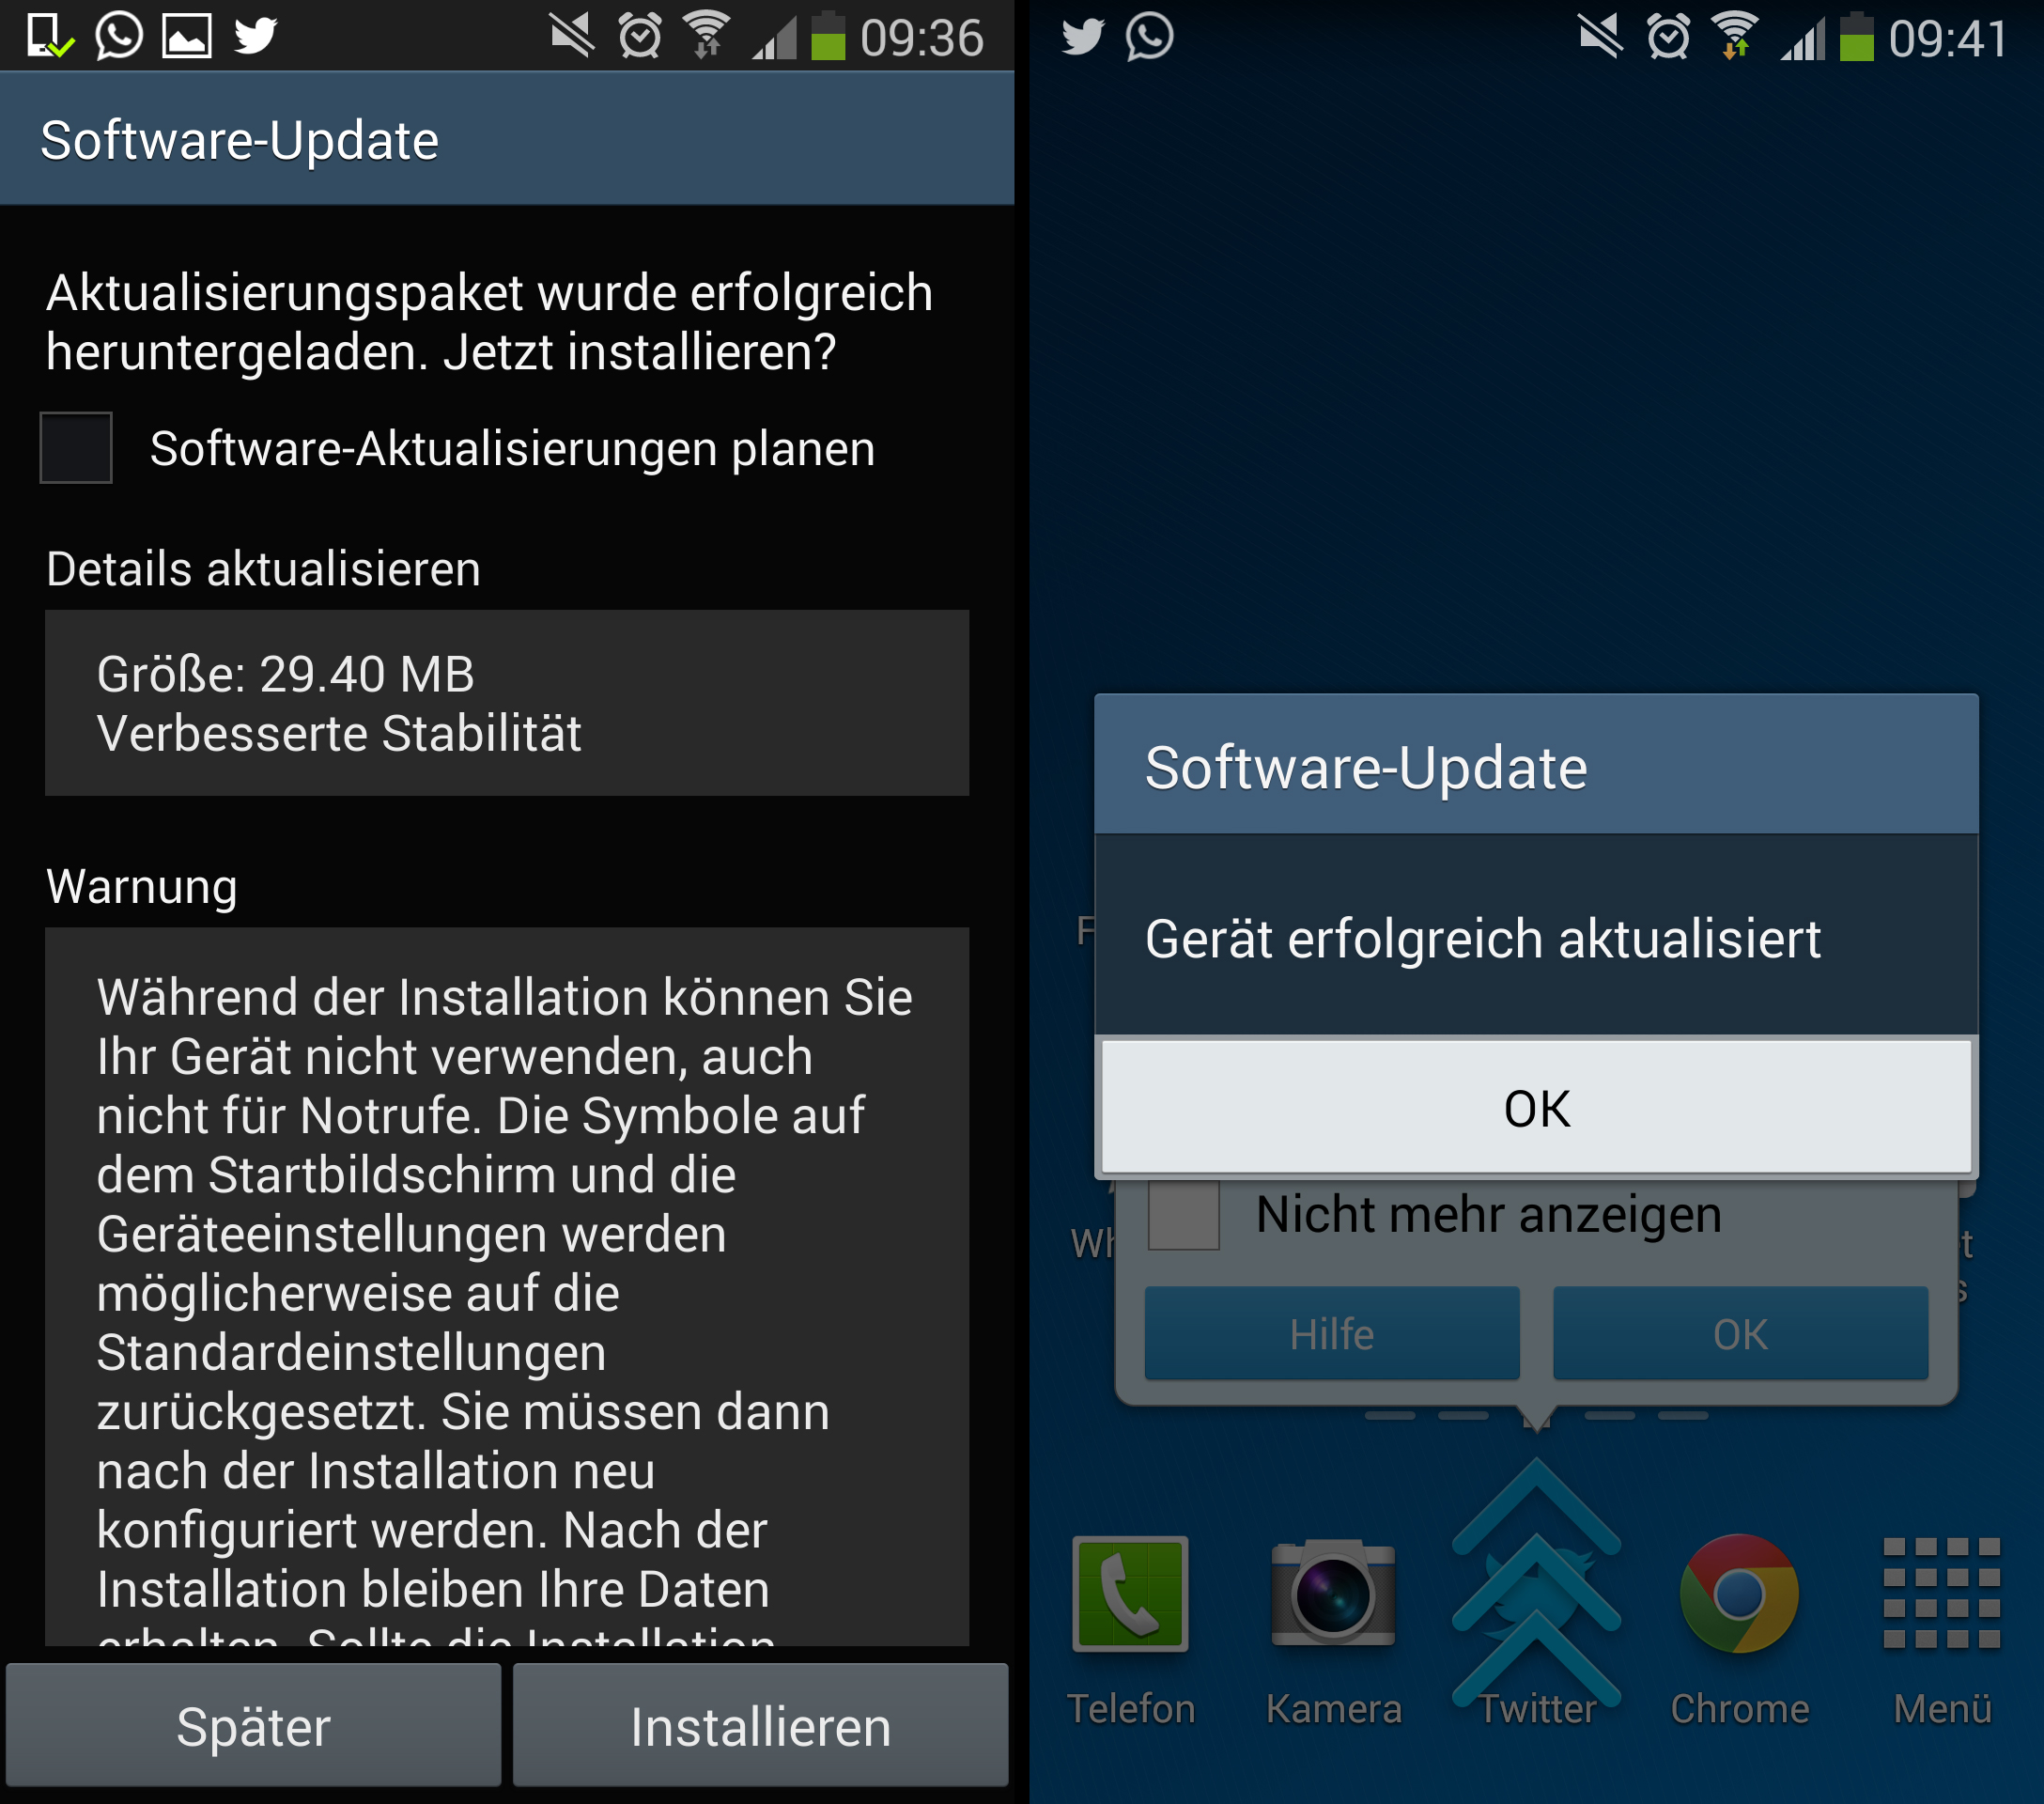 Samsung Galaxy Note 3 receiving second update